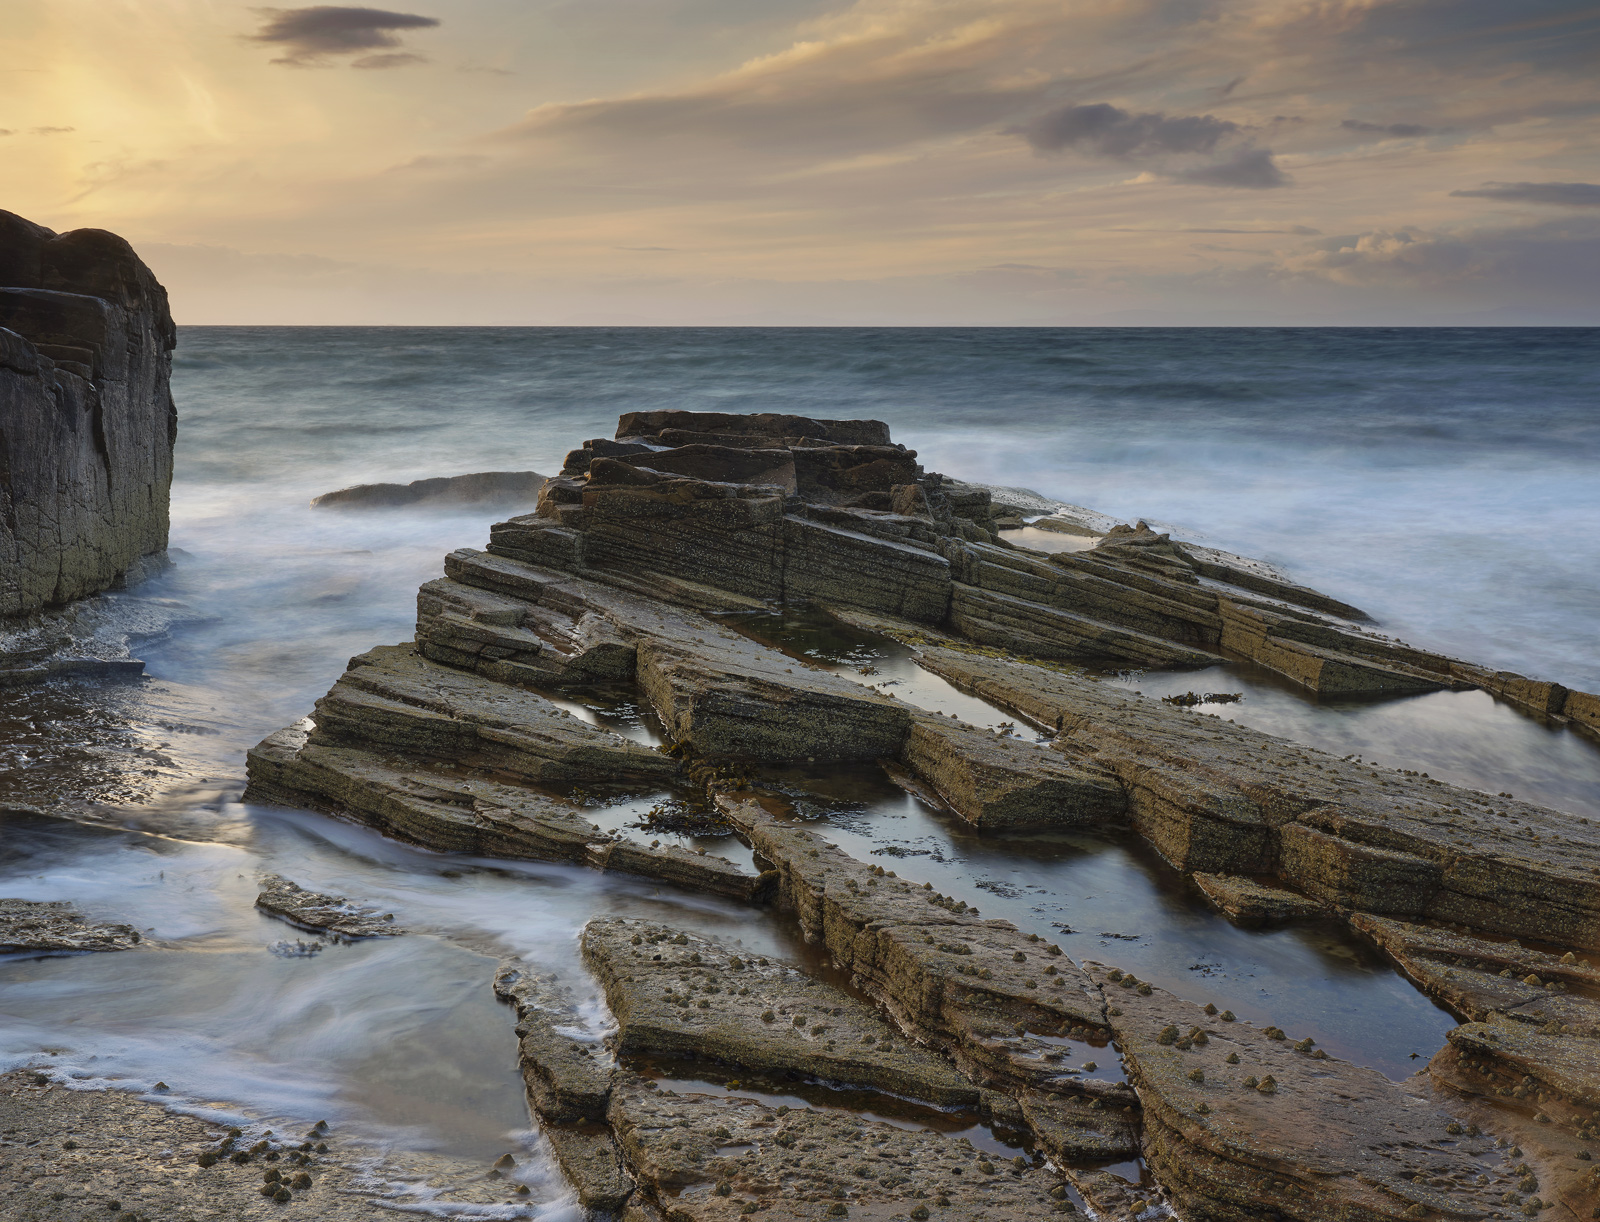 Tide and Motion Hopeman, Hopeman, Moray, Scotland, turbulent, irresistable, opposing, gold, blue, reflecting, banana, ti, photo